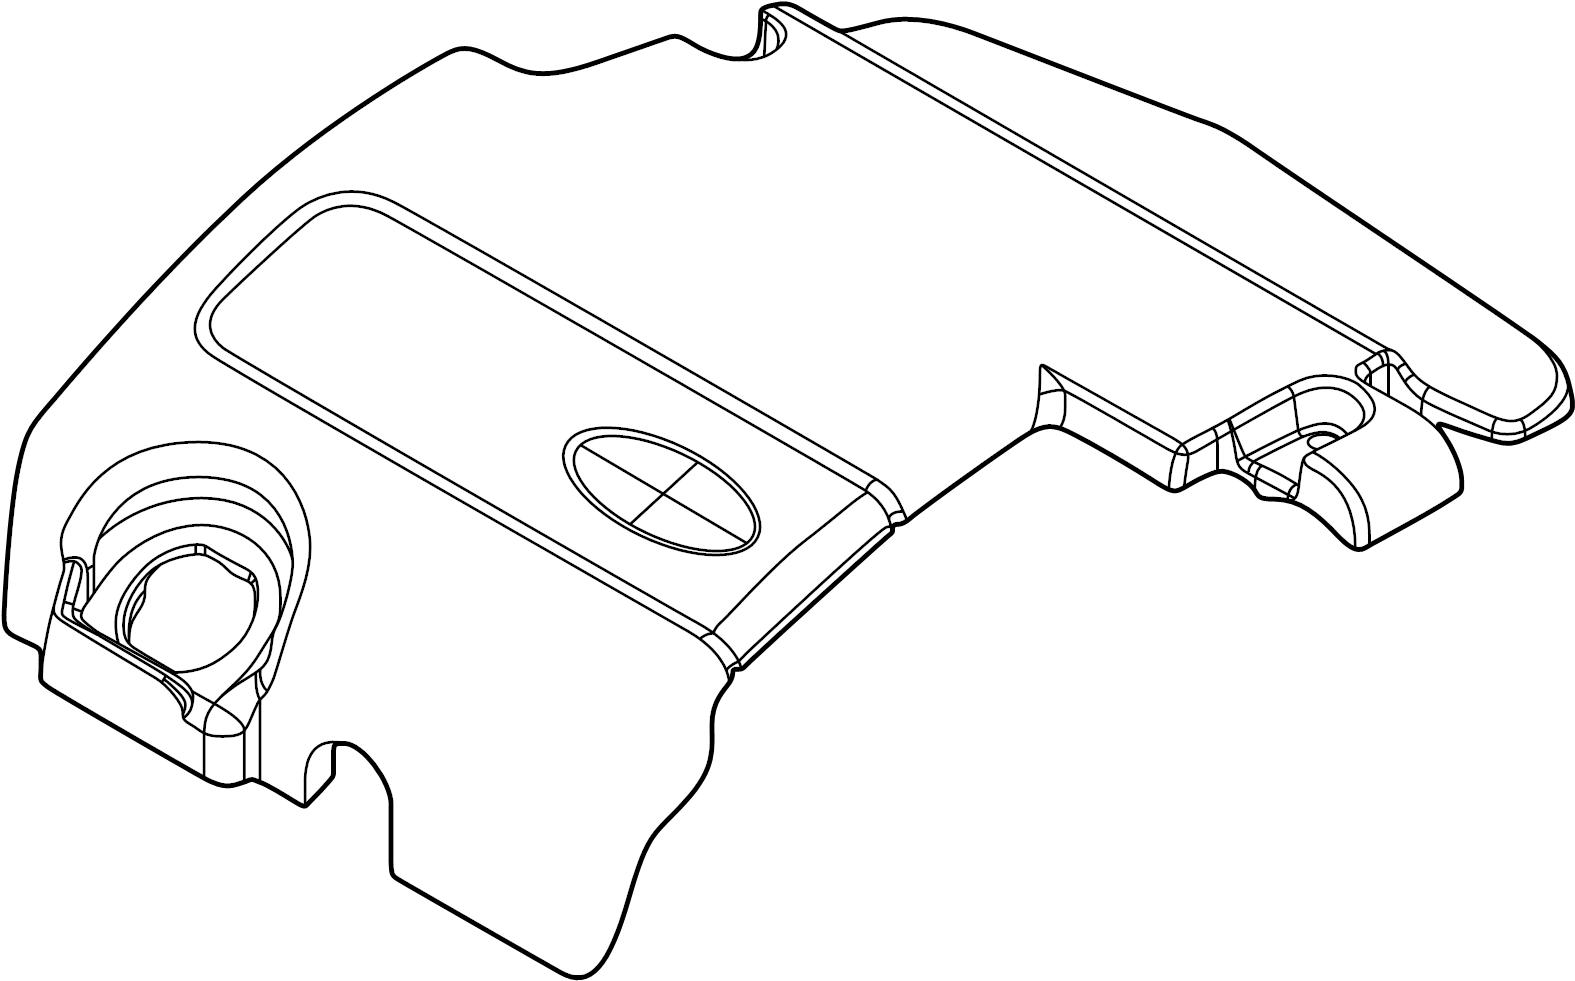 Ford Explorer Engine Cover Non Liter Transaxle